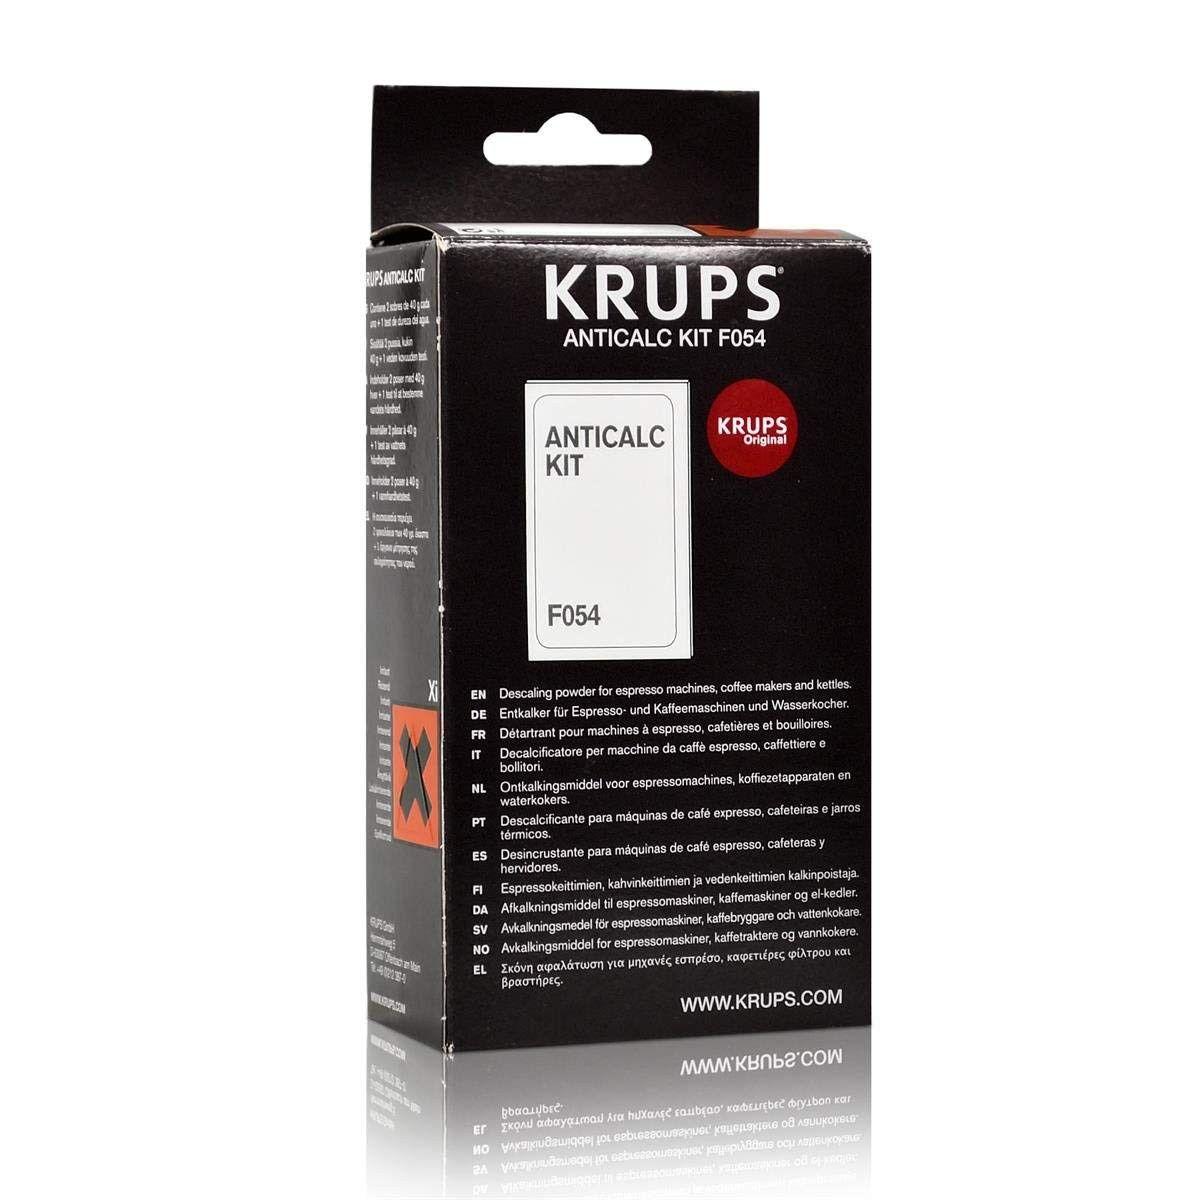 Antical Cafetera Krups F054